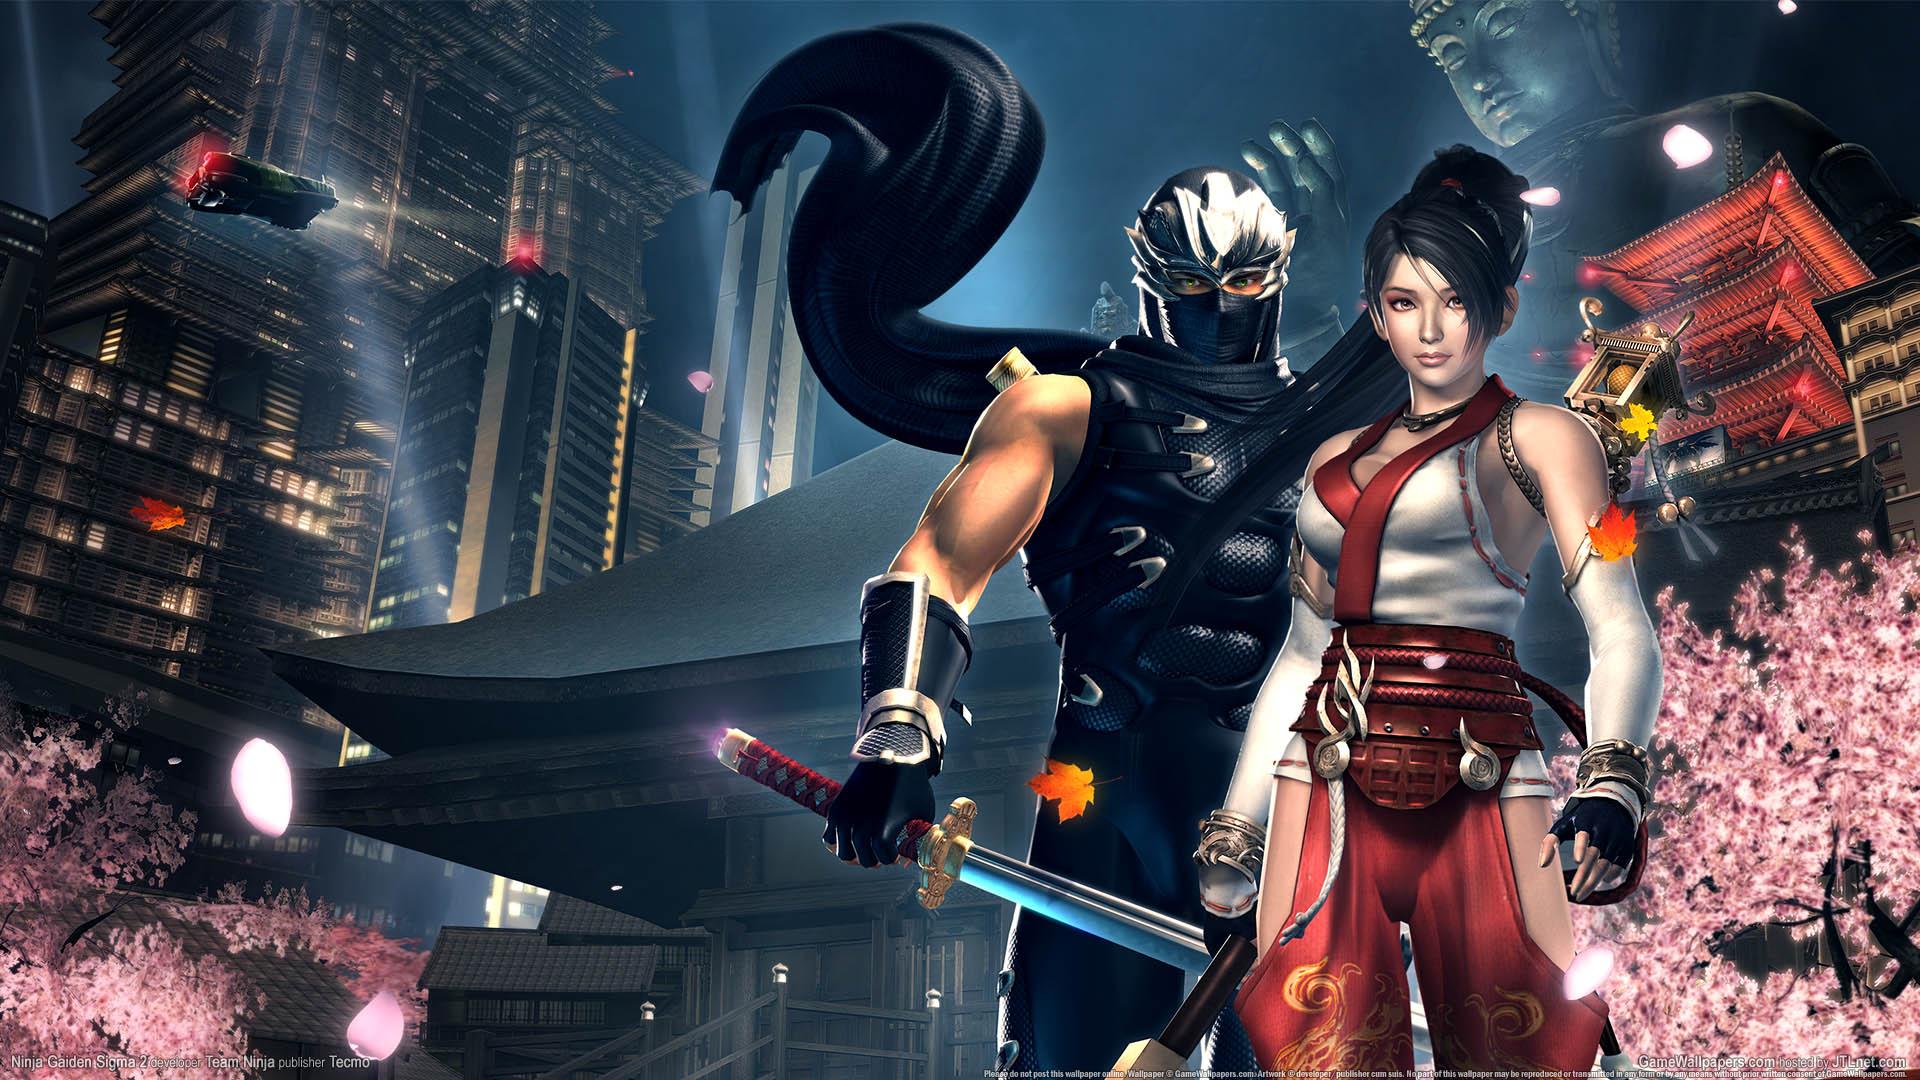 Ninja Gaiden Sigma 2 Hintergrundbild 01 1920x1080